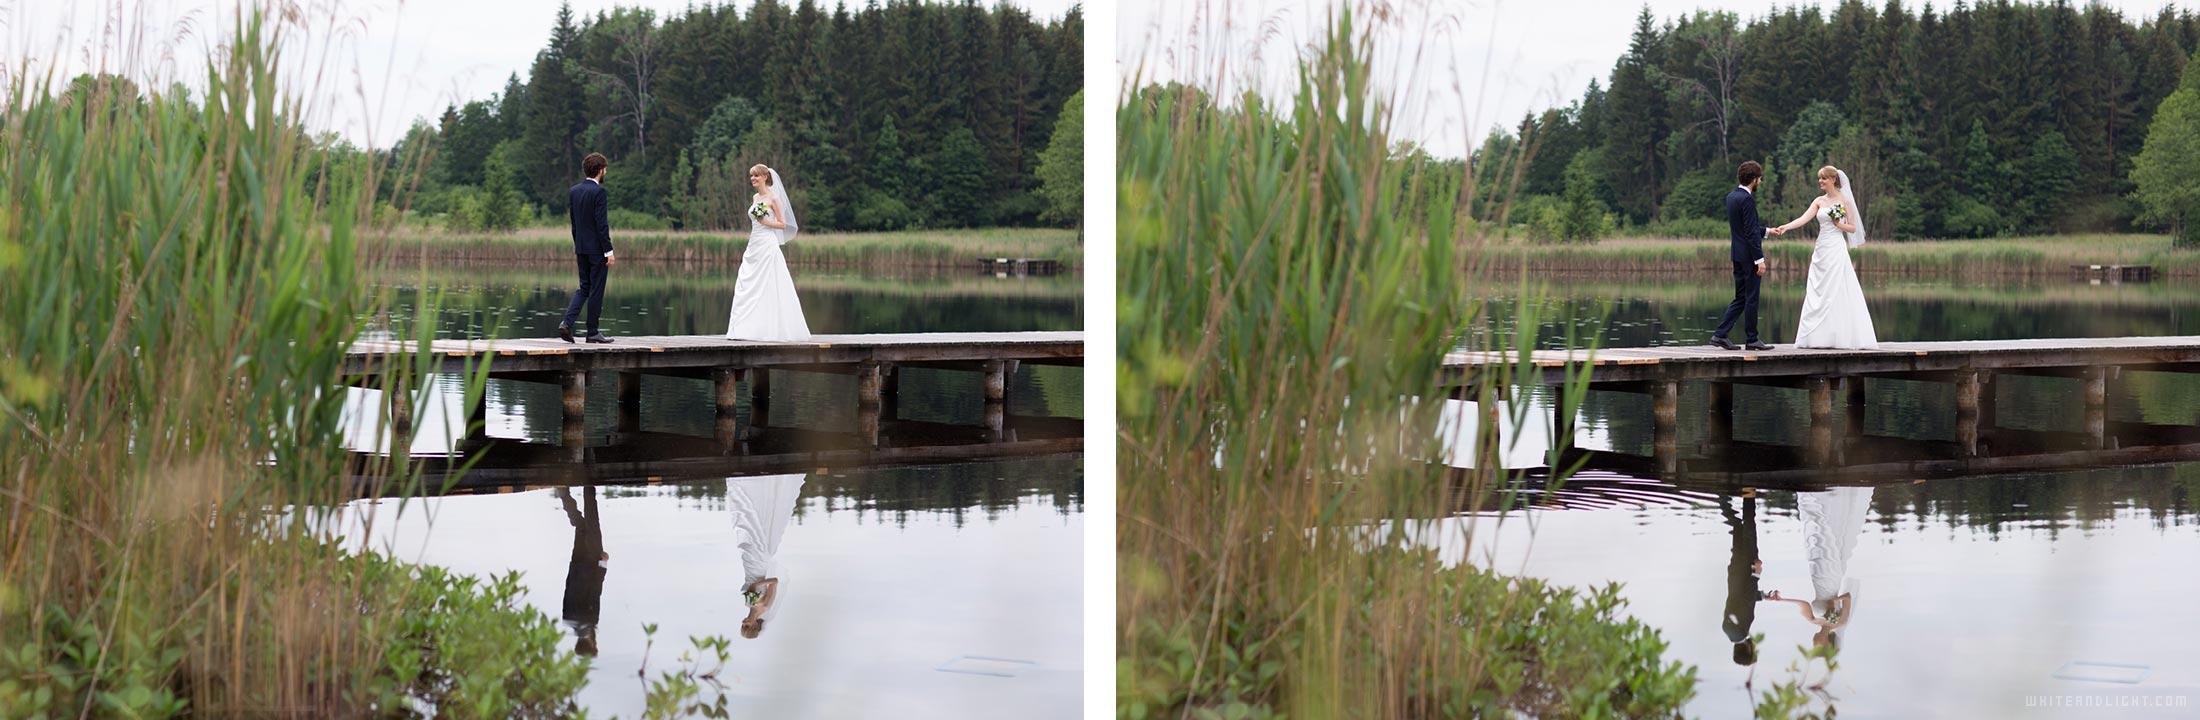 cost of wedding photographer Bavaria